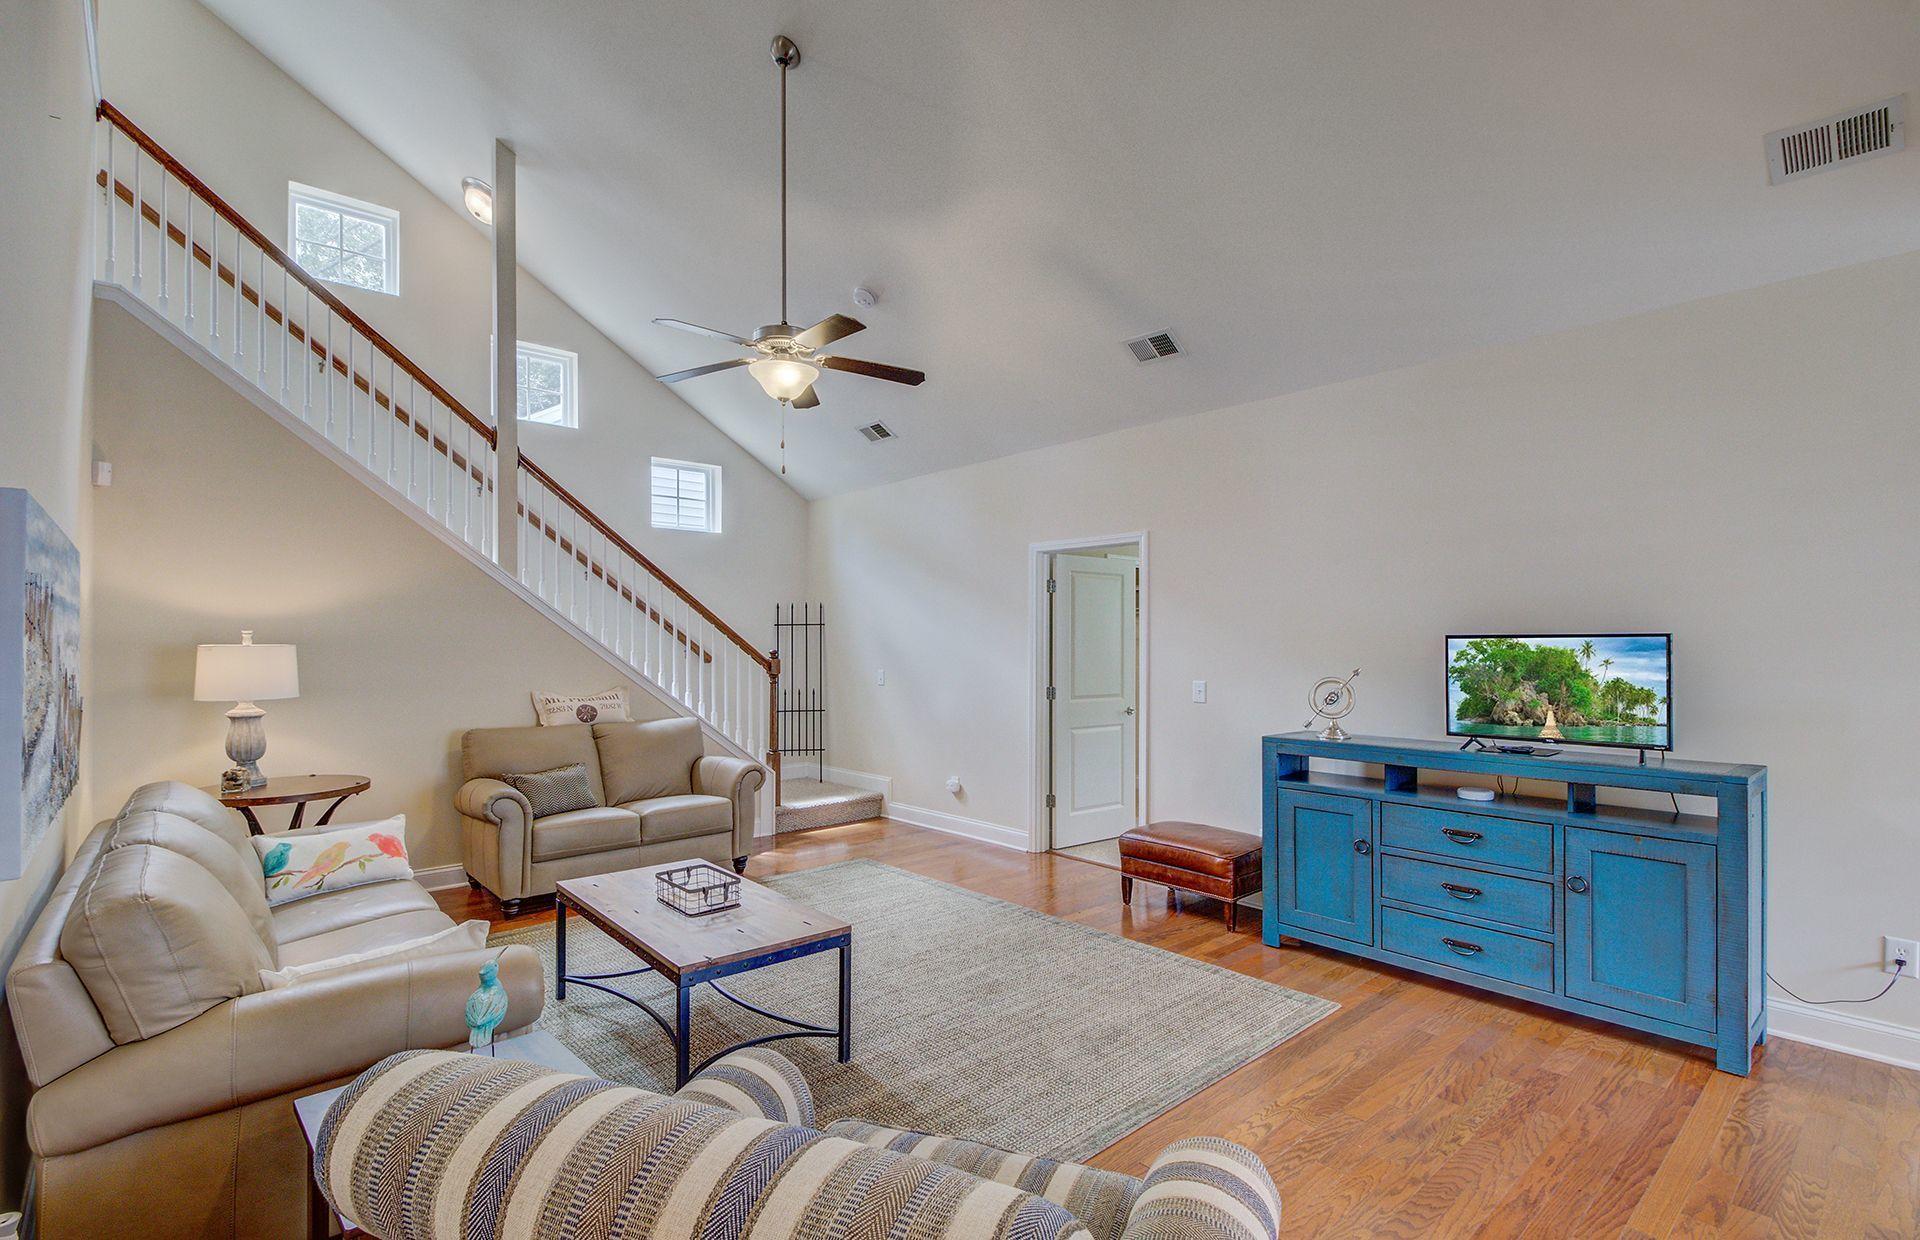 Linnen Place Homes For Sale - 1275 Shingleback, Mount Pleasant, SC - 23